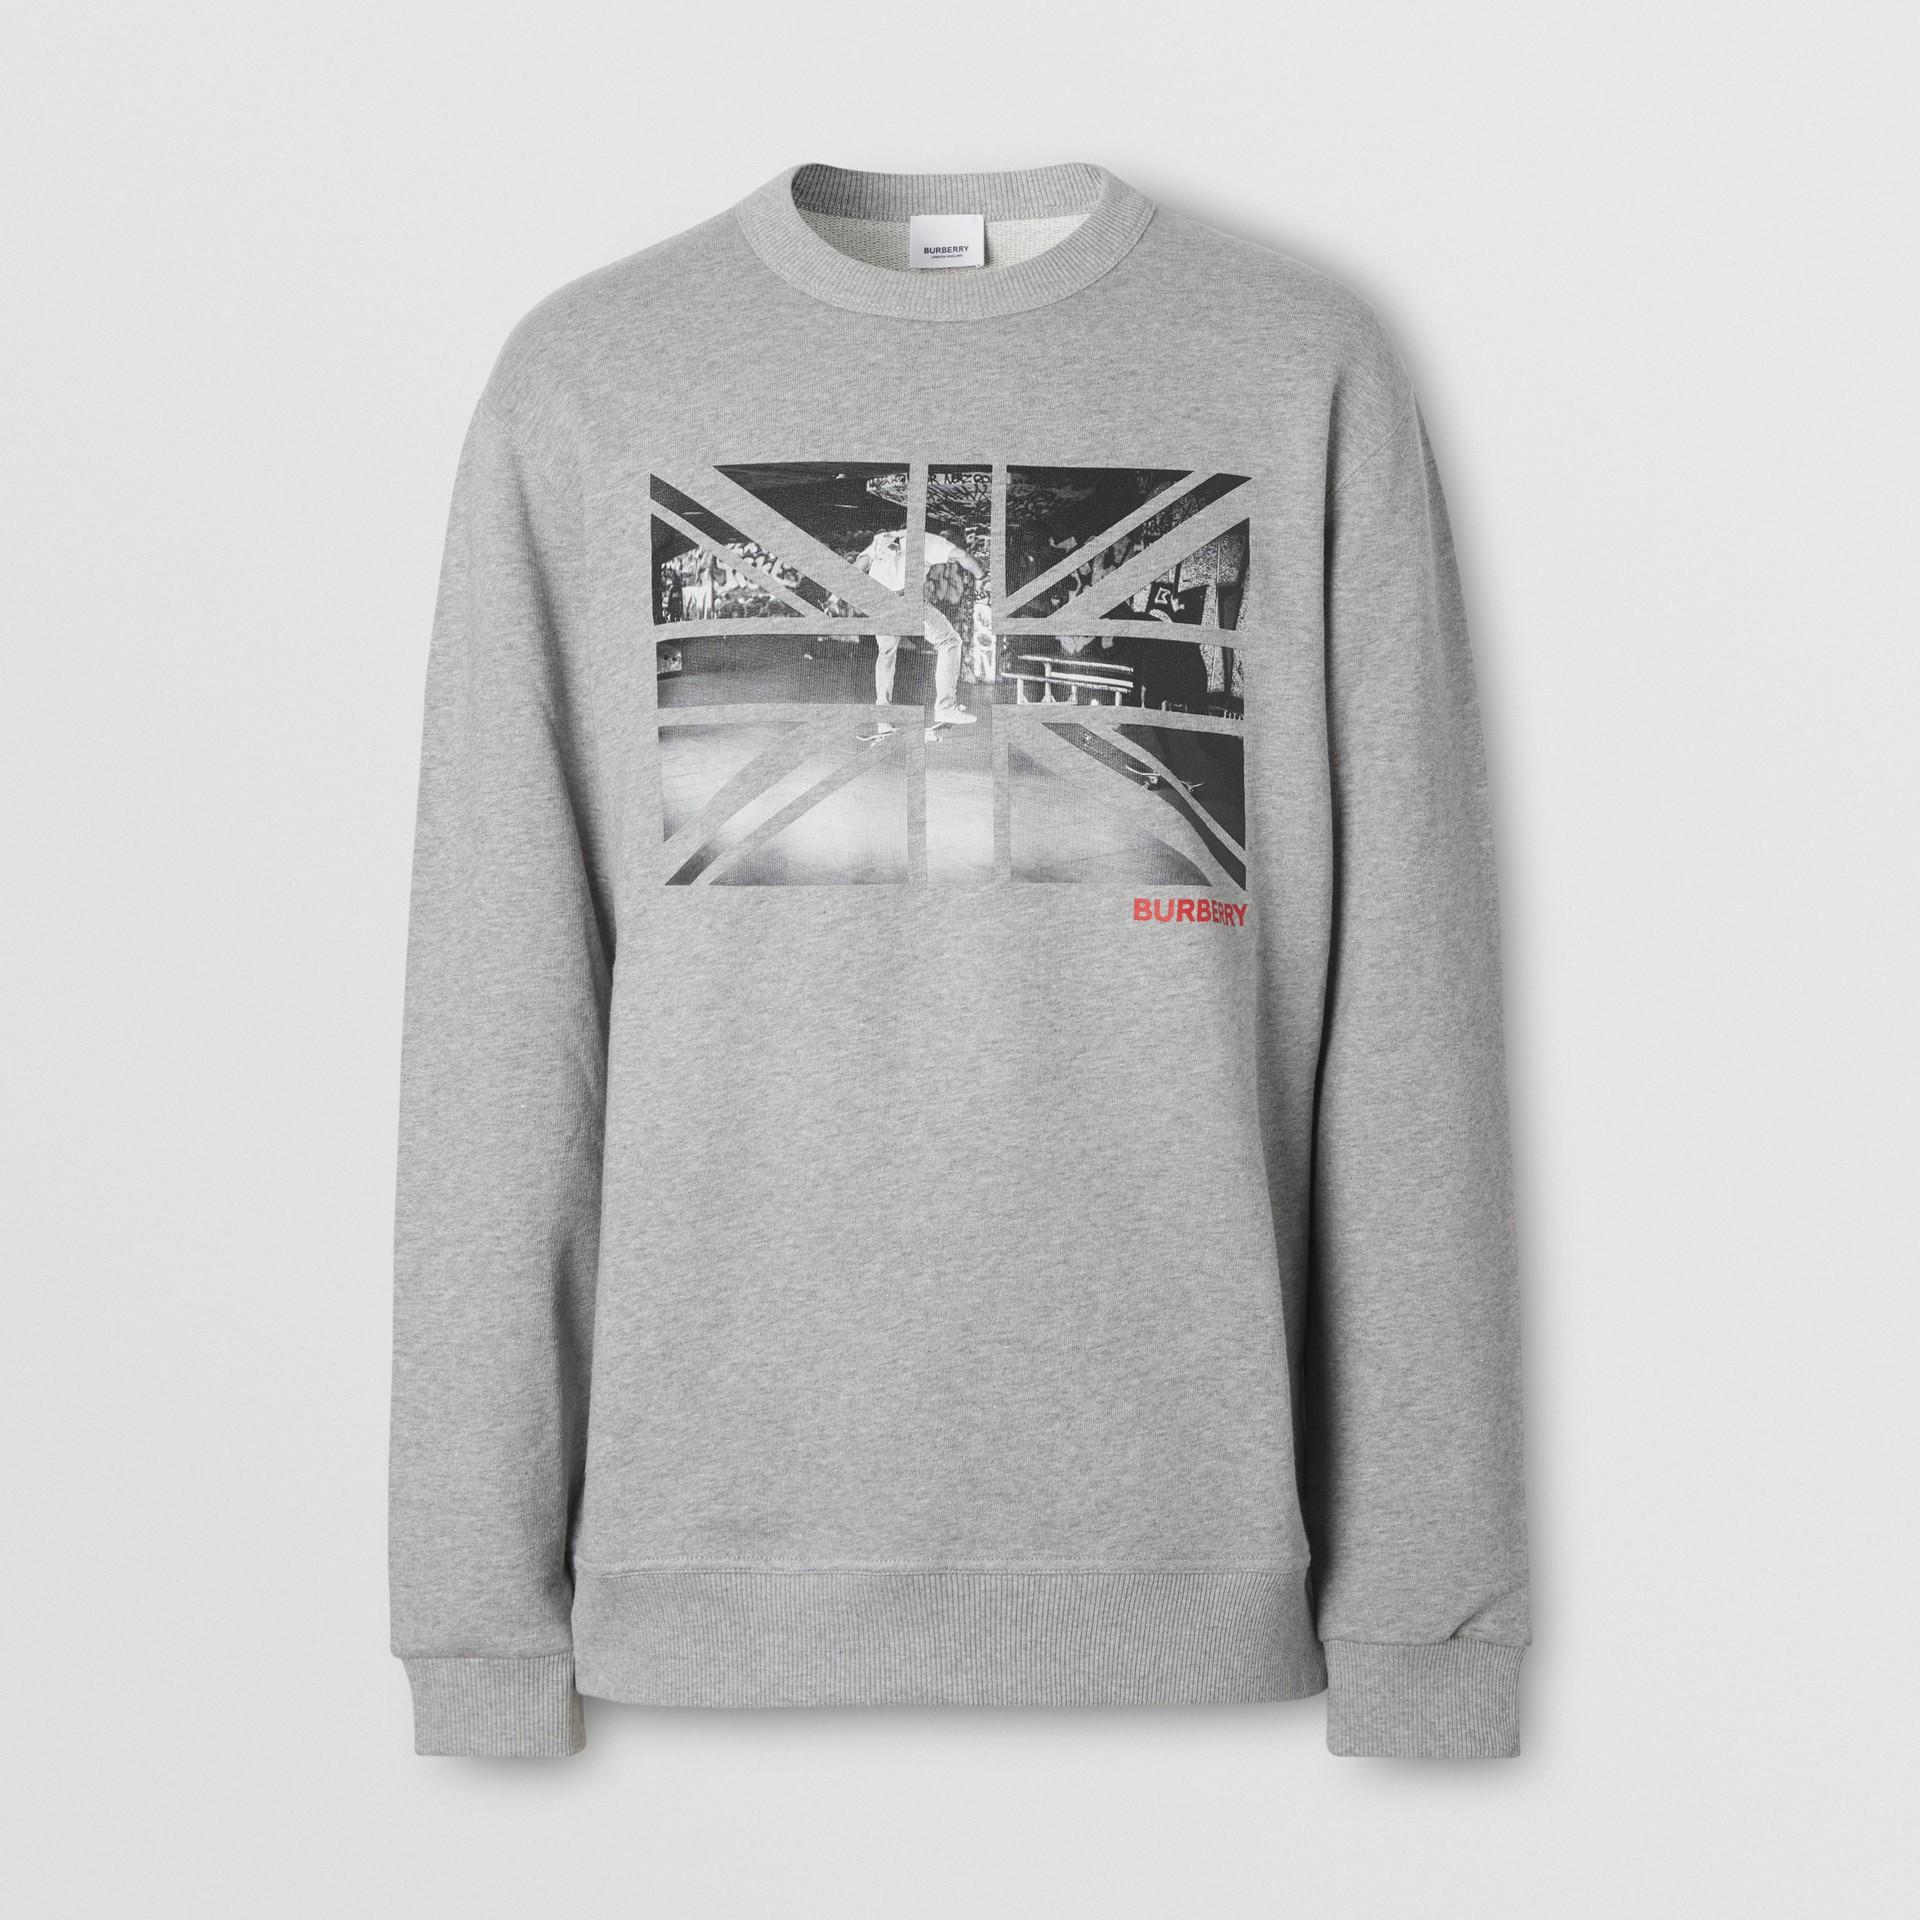 Union Jack Photo Print Cotton Sweatshirt in Pale Grey Melange - Men | Burberry - gallery image 3